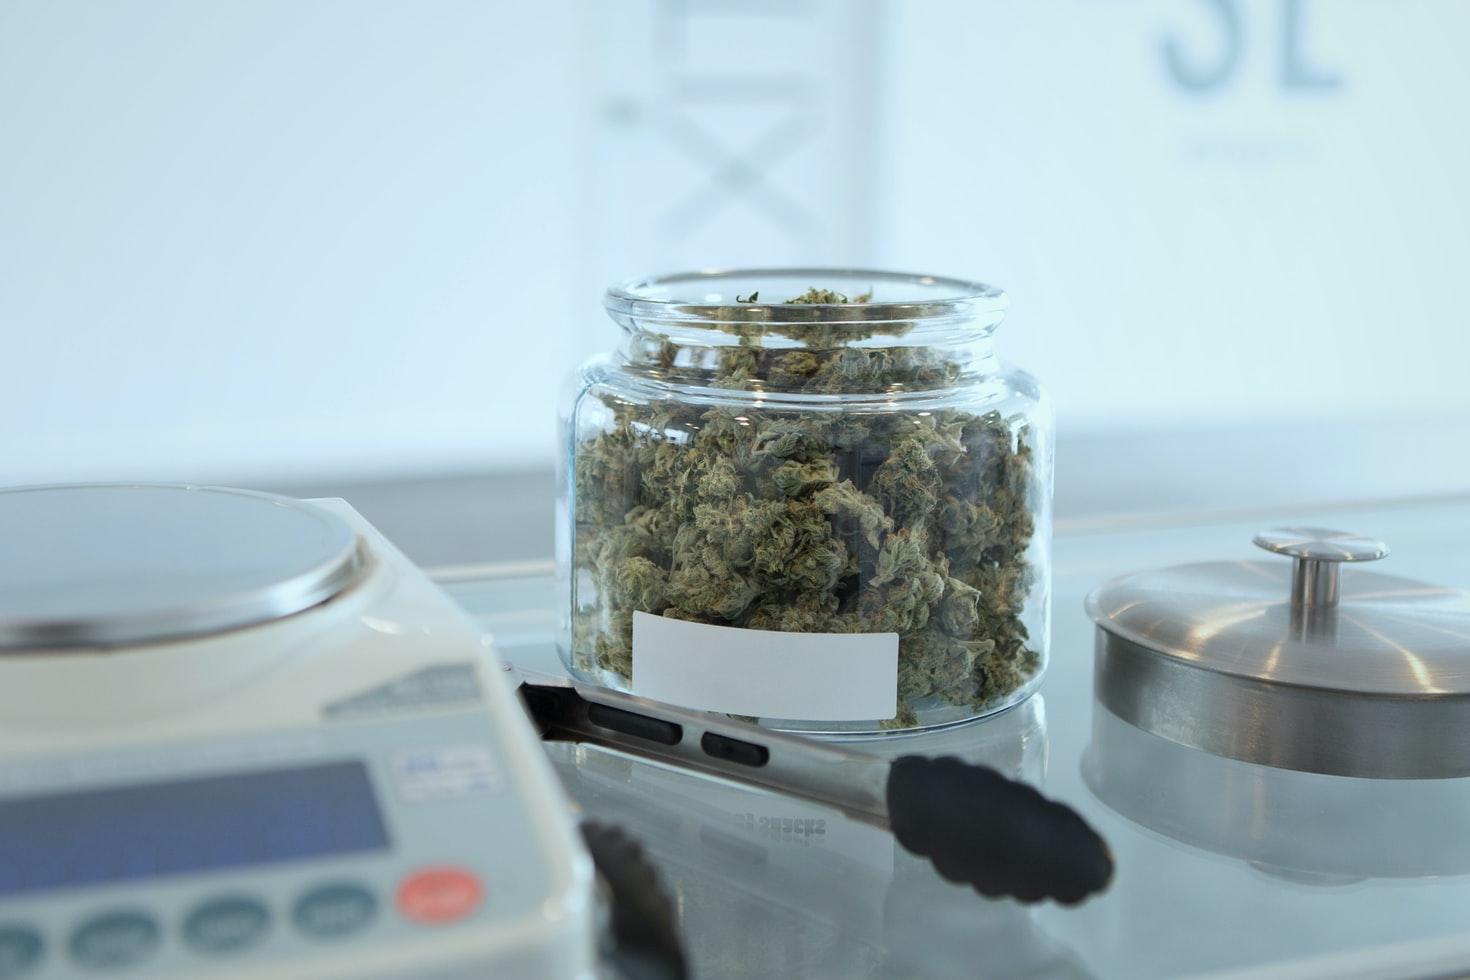 regulating cannabis social clubs regulando clubes sociales de cannabis CSCs